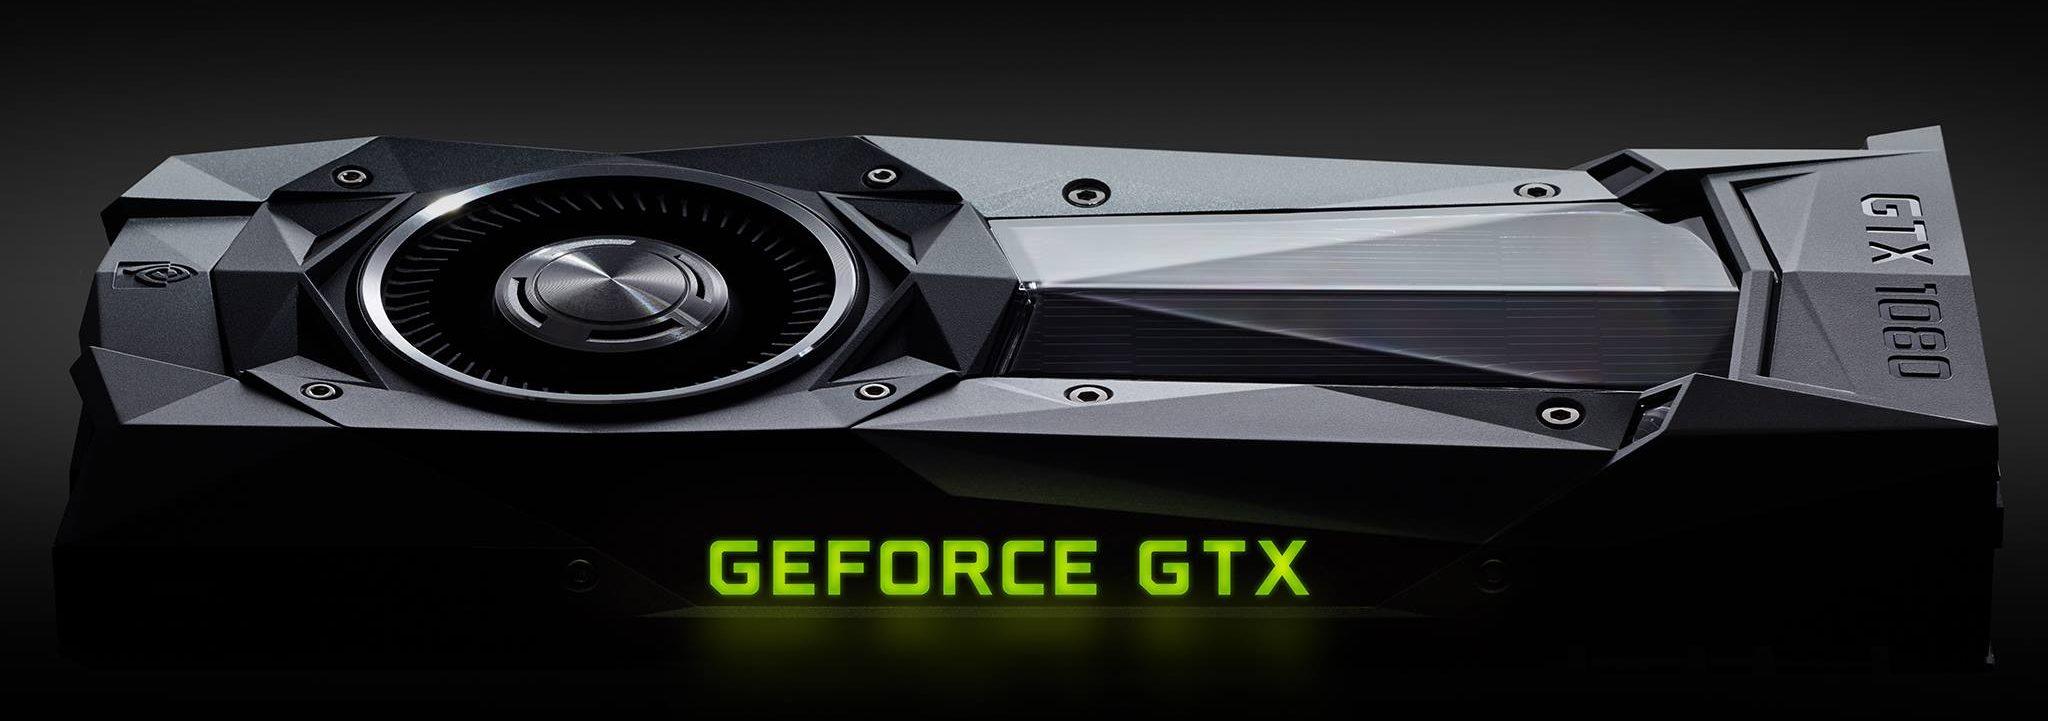 La NVIDIA GeForce GTX 1080 en photos